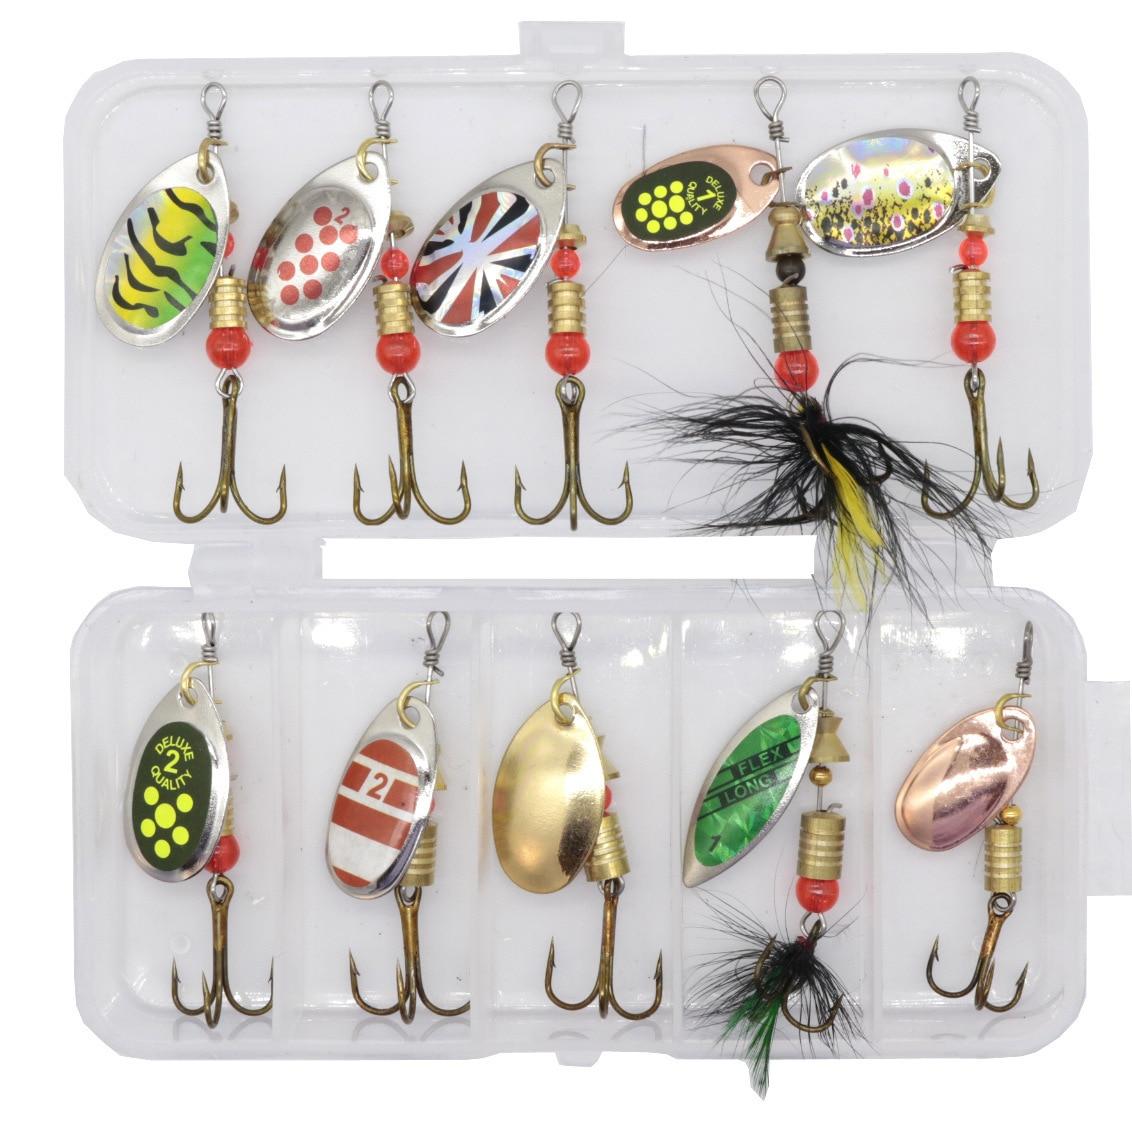 Metal Spoon Spinner Bait 2.5-4.4g  Feather Hooks Sequin Sea Fishing Lure Isca Artificial Paillette Wobbler Jig Metal Buzz Bait